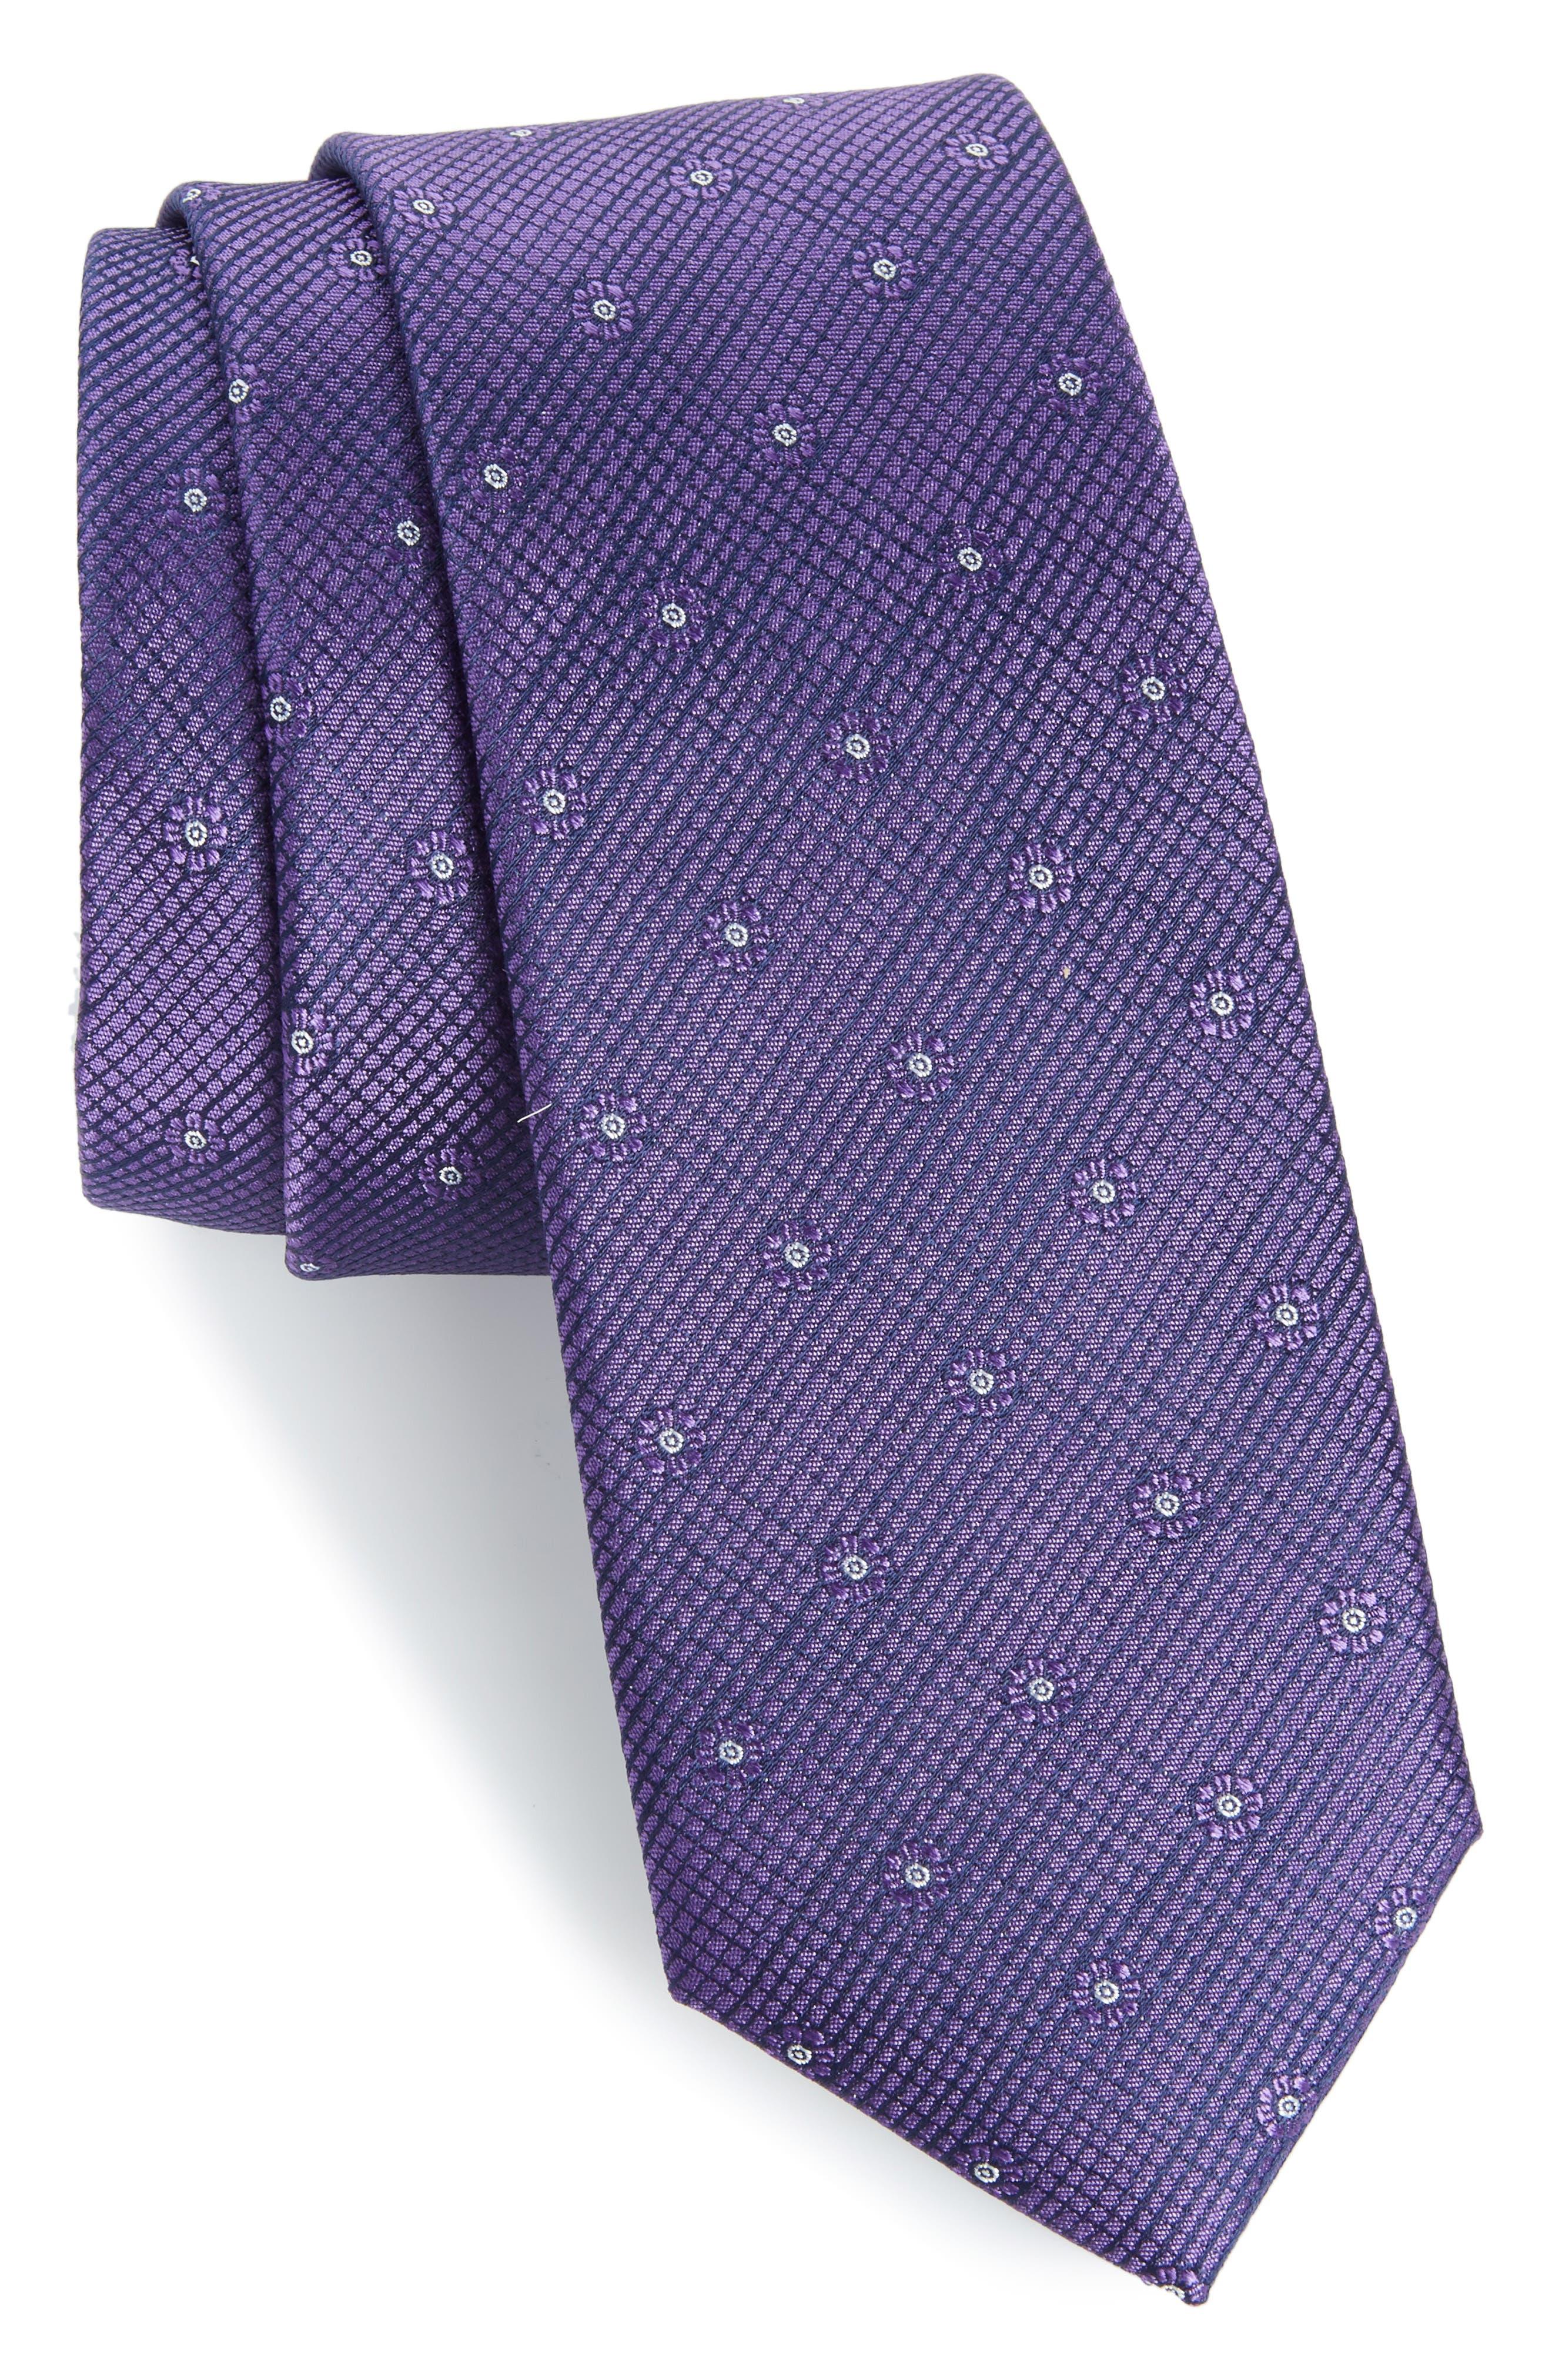 Fleur Medallion Silk Skinny Tie,                         Main,                         color, Purple